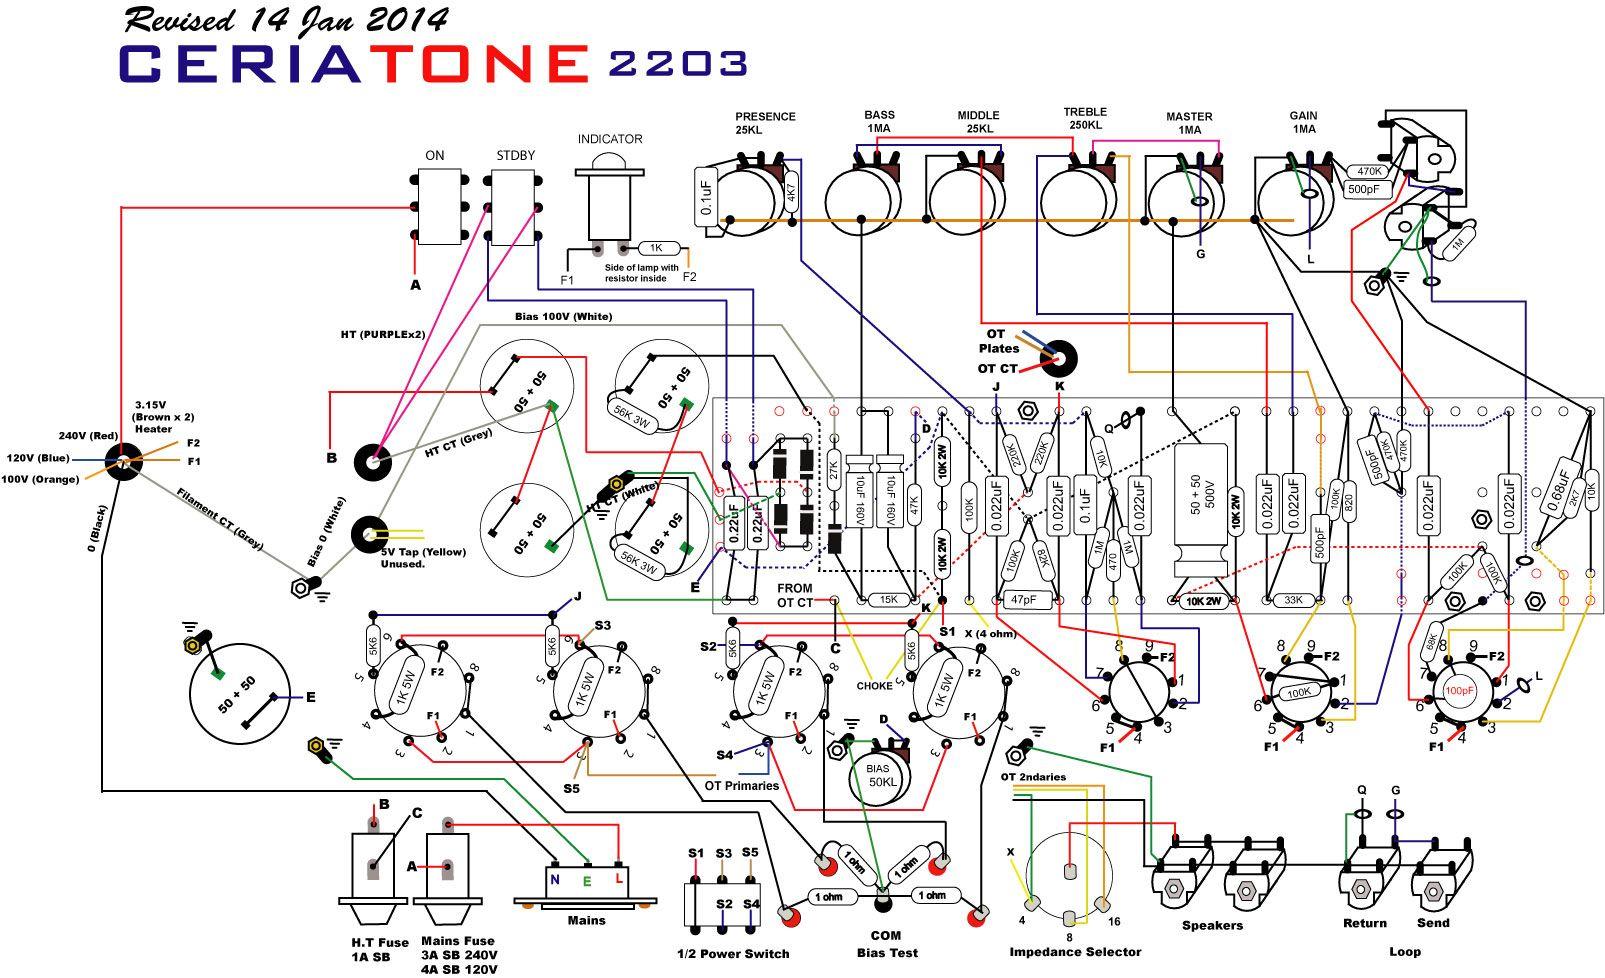 ceriatone 2203 layout amplifiers valve amplifier guitar amp bass amps. Black Bedroom Furniture Sets. Home Design Ideas